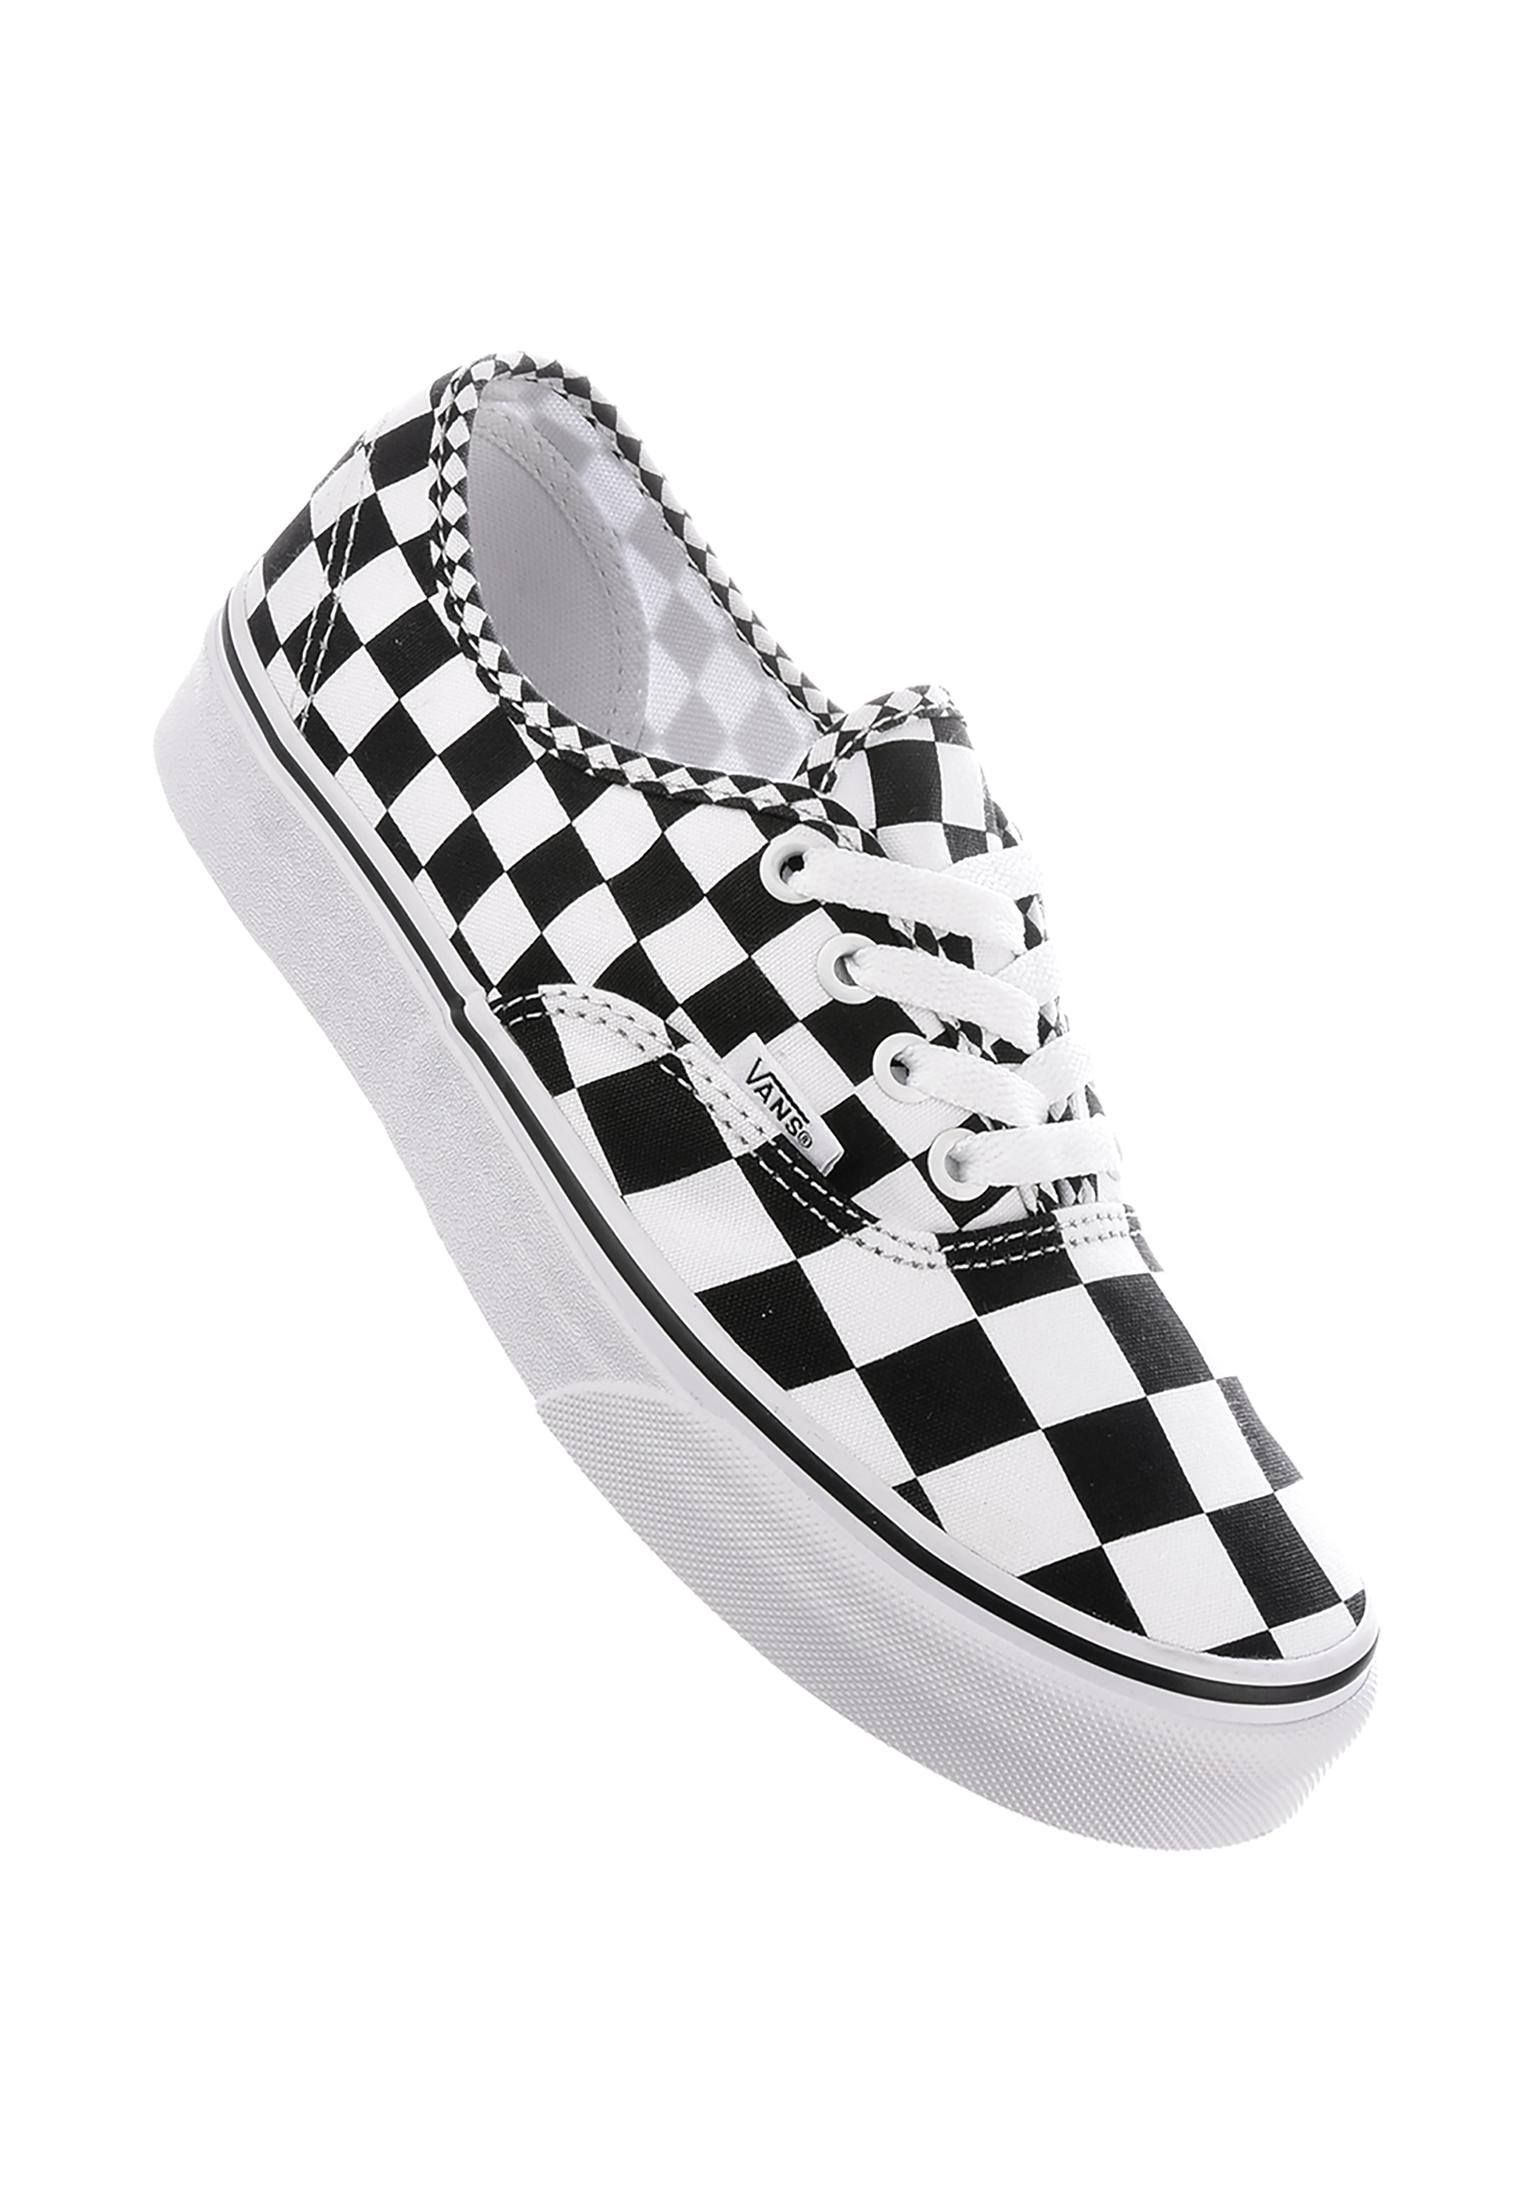 3ac4b88004b7d9 Authentic Classic Vans Alle Schuhe in mixchecker-black-truewhite für Damen